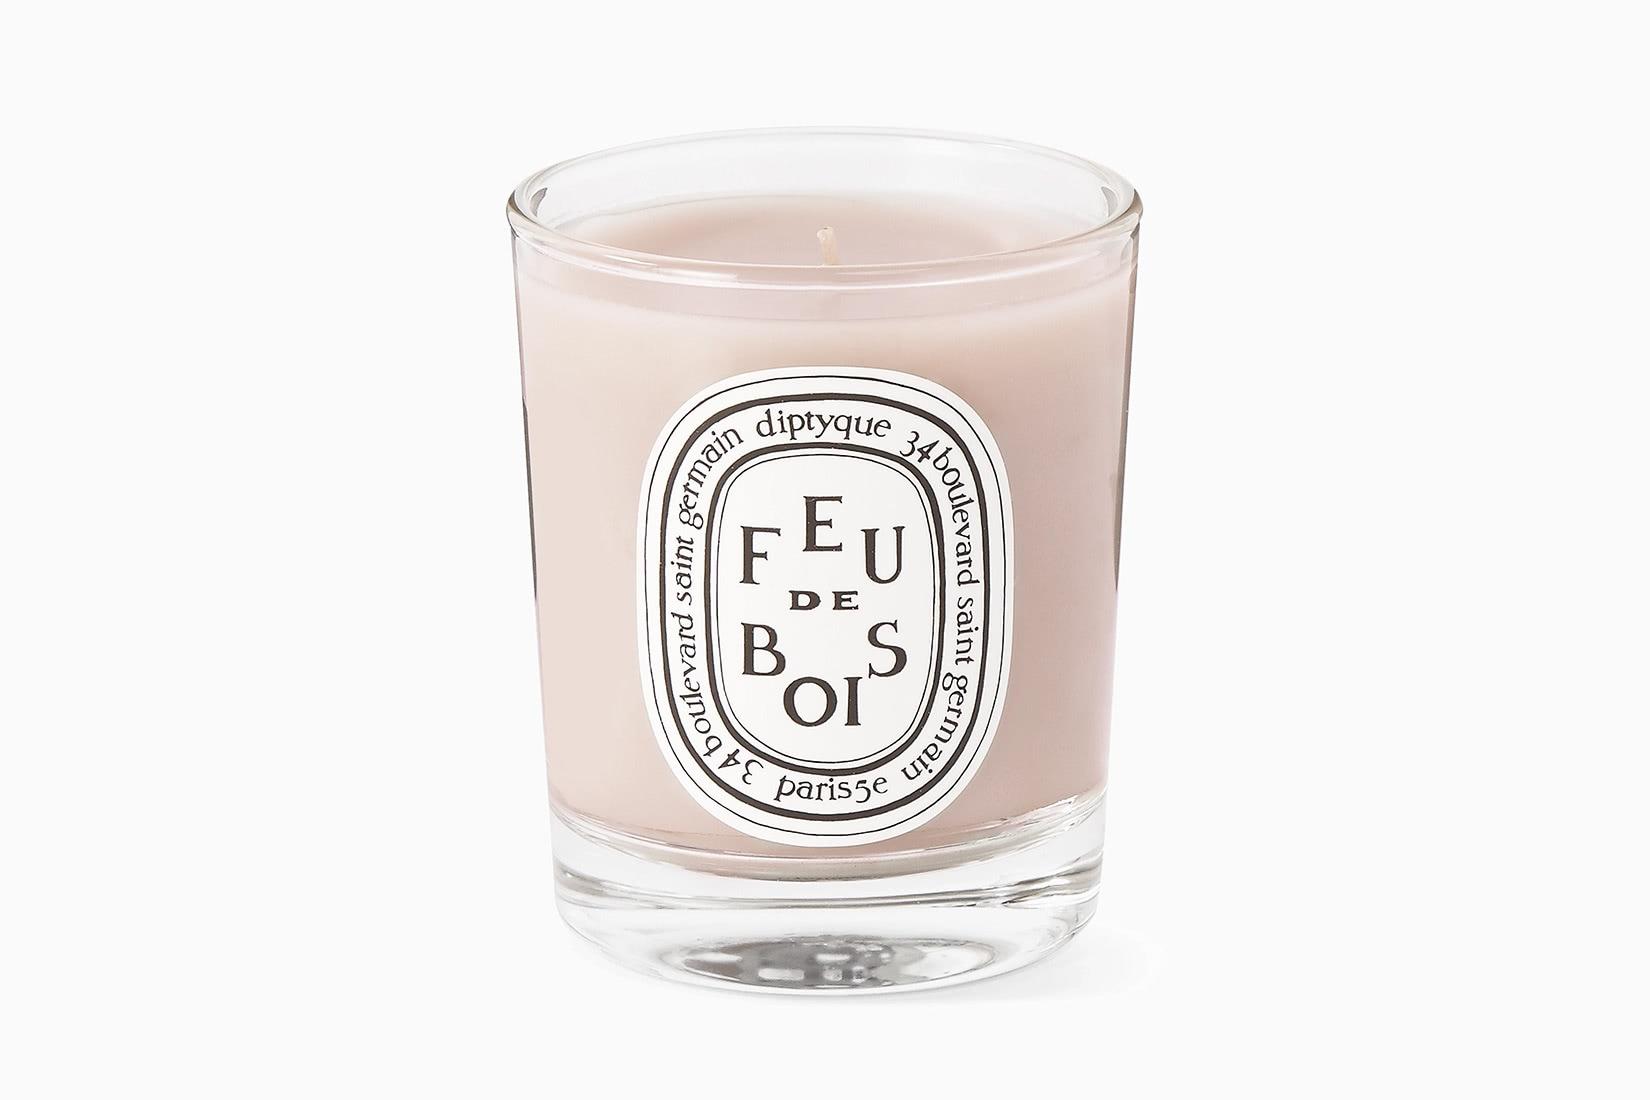 best scented candles diptyque feu de bois home fragrance - Luxe Digital